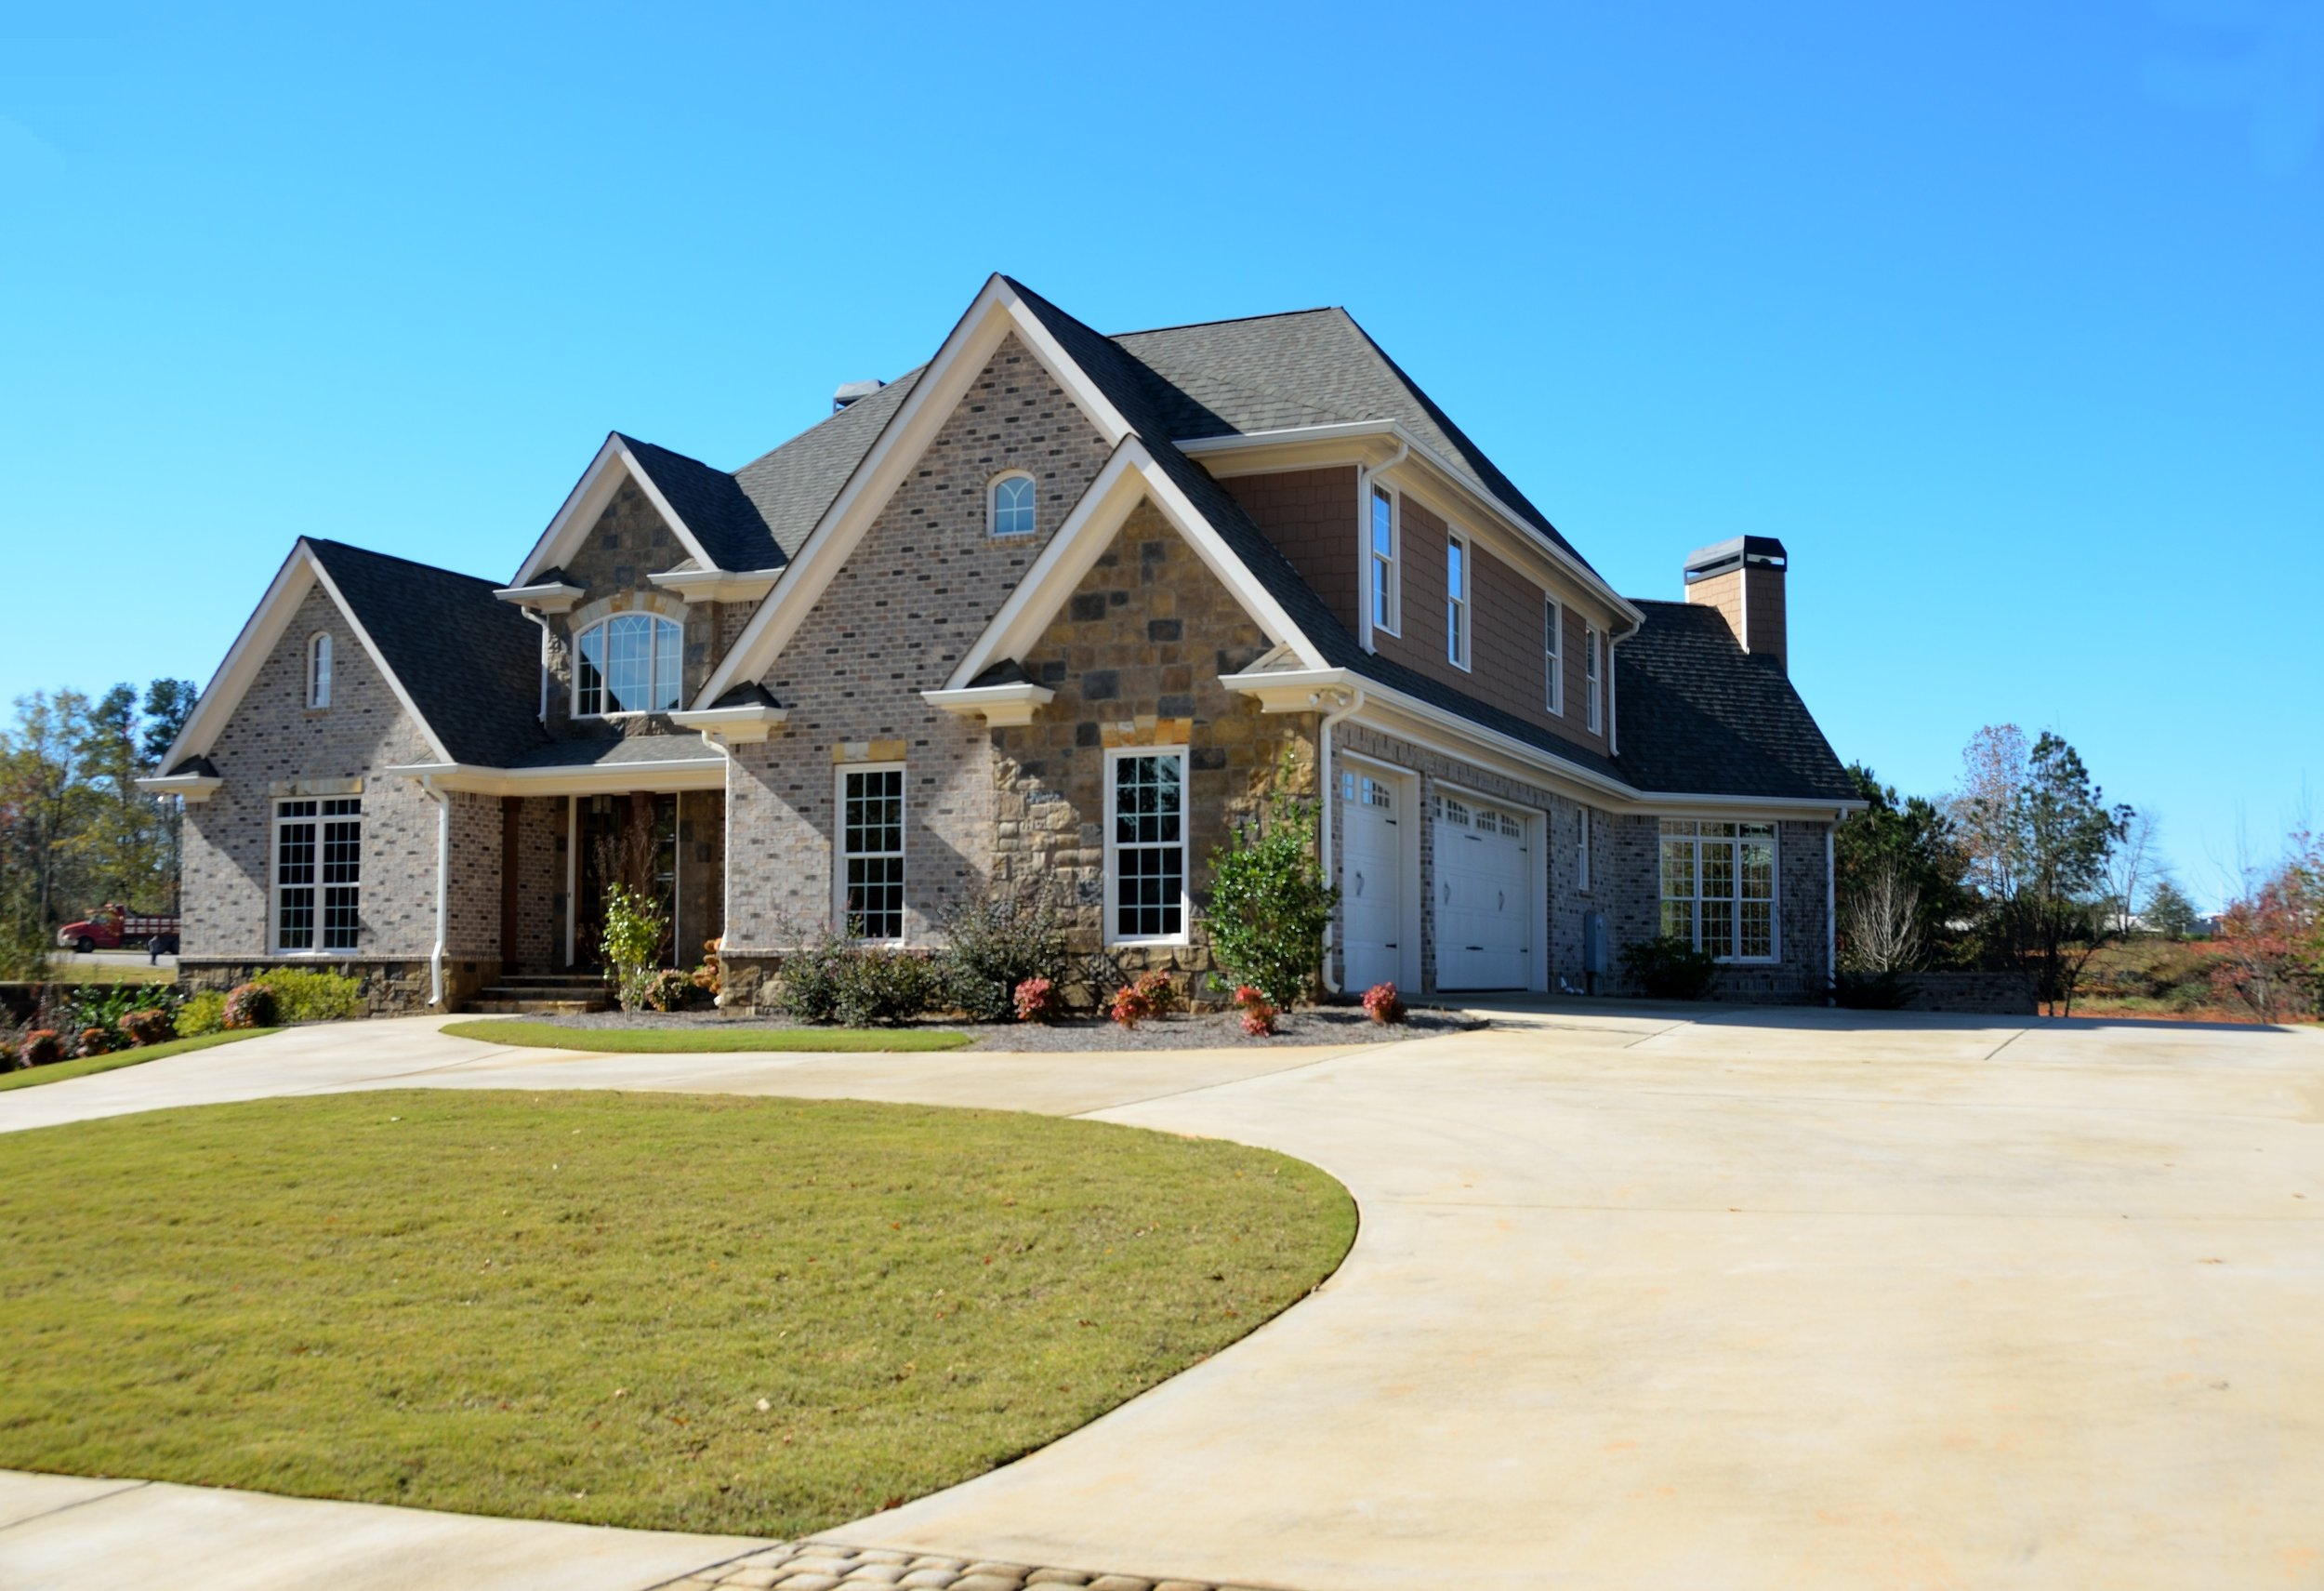 real_estate_home_ky.jpg